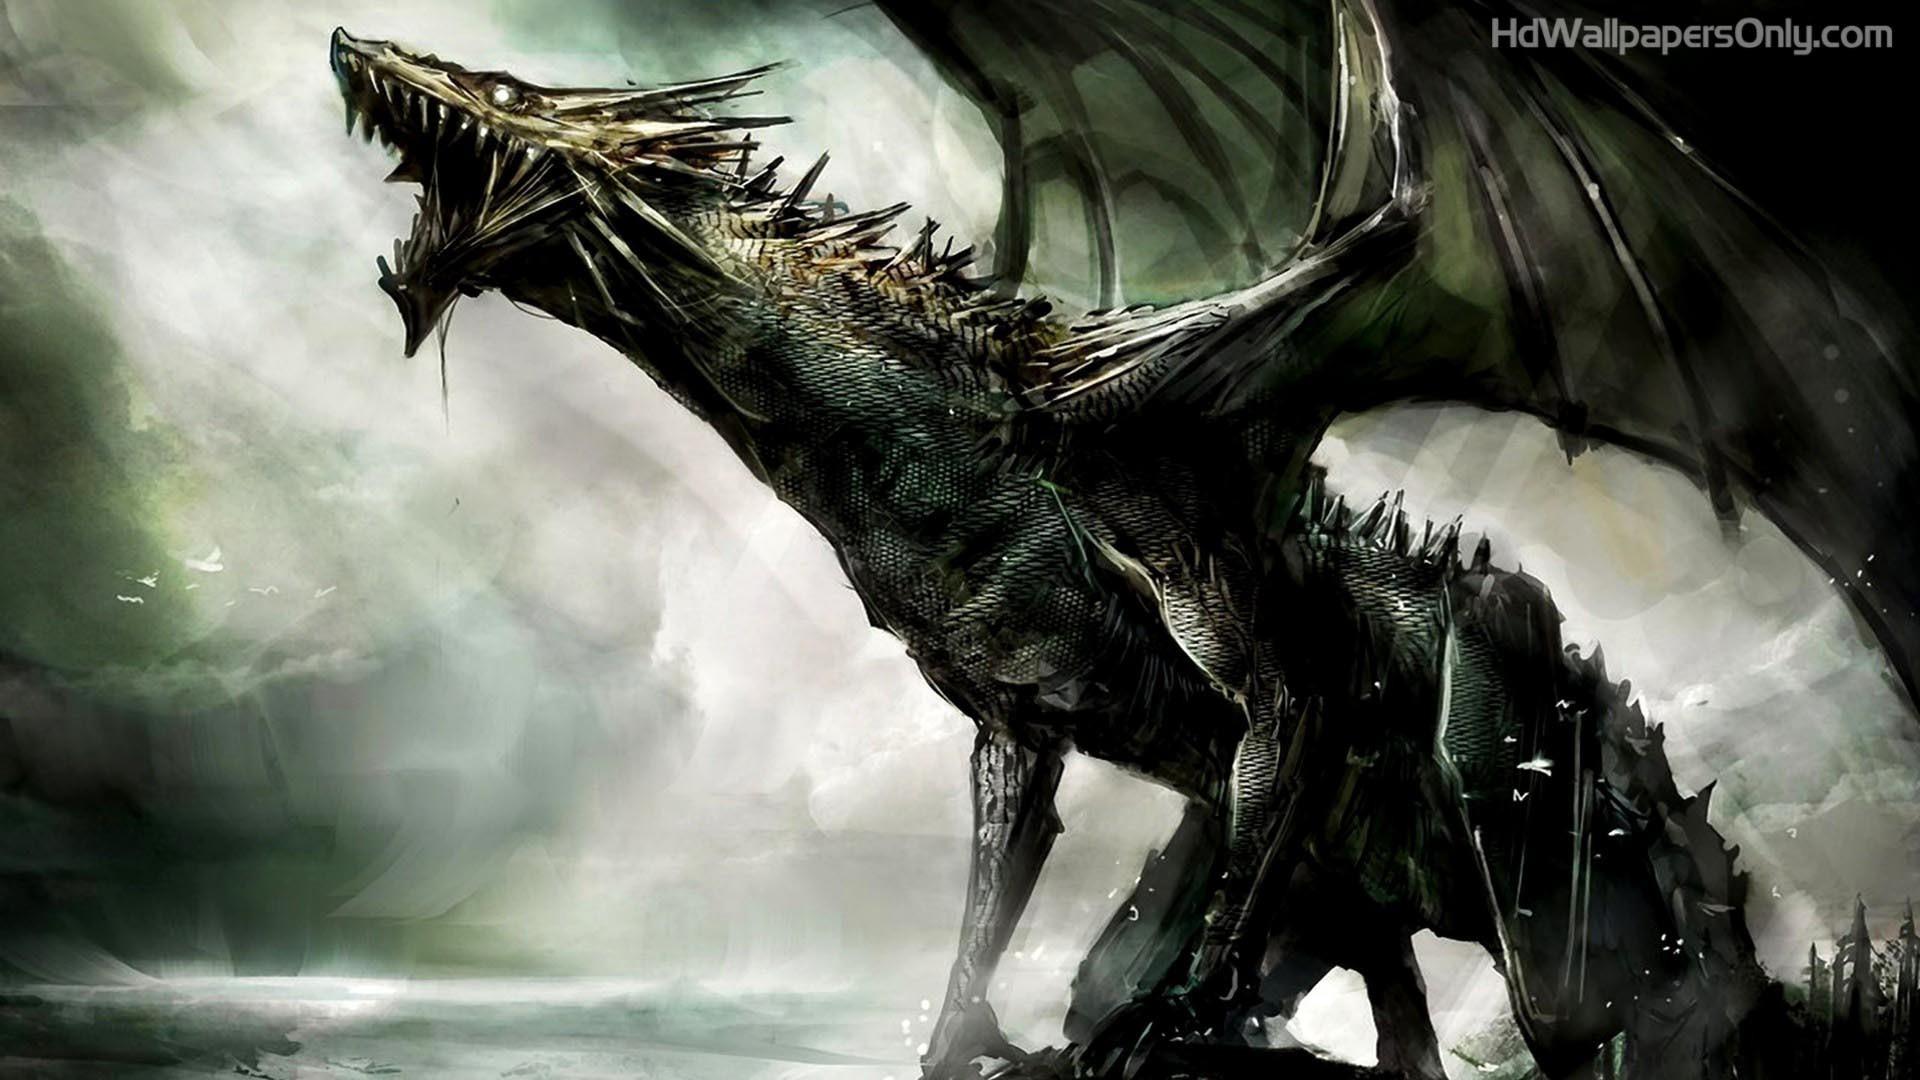 Black Dragon HD Wallpaper   4hotos